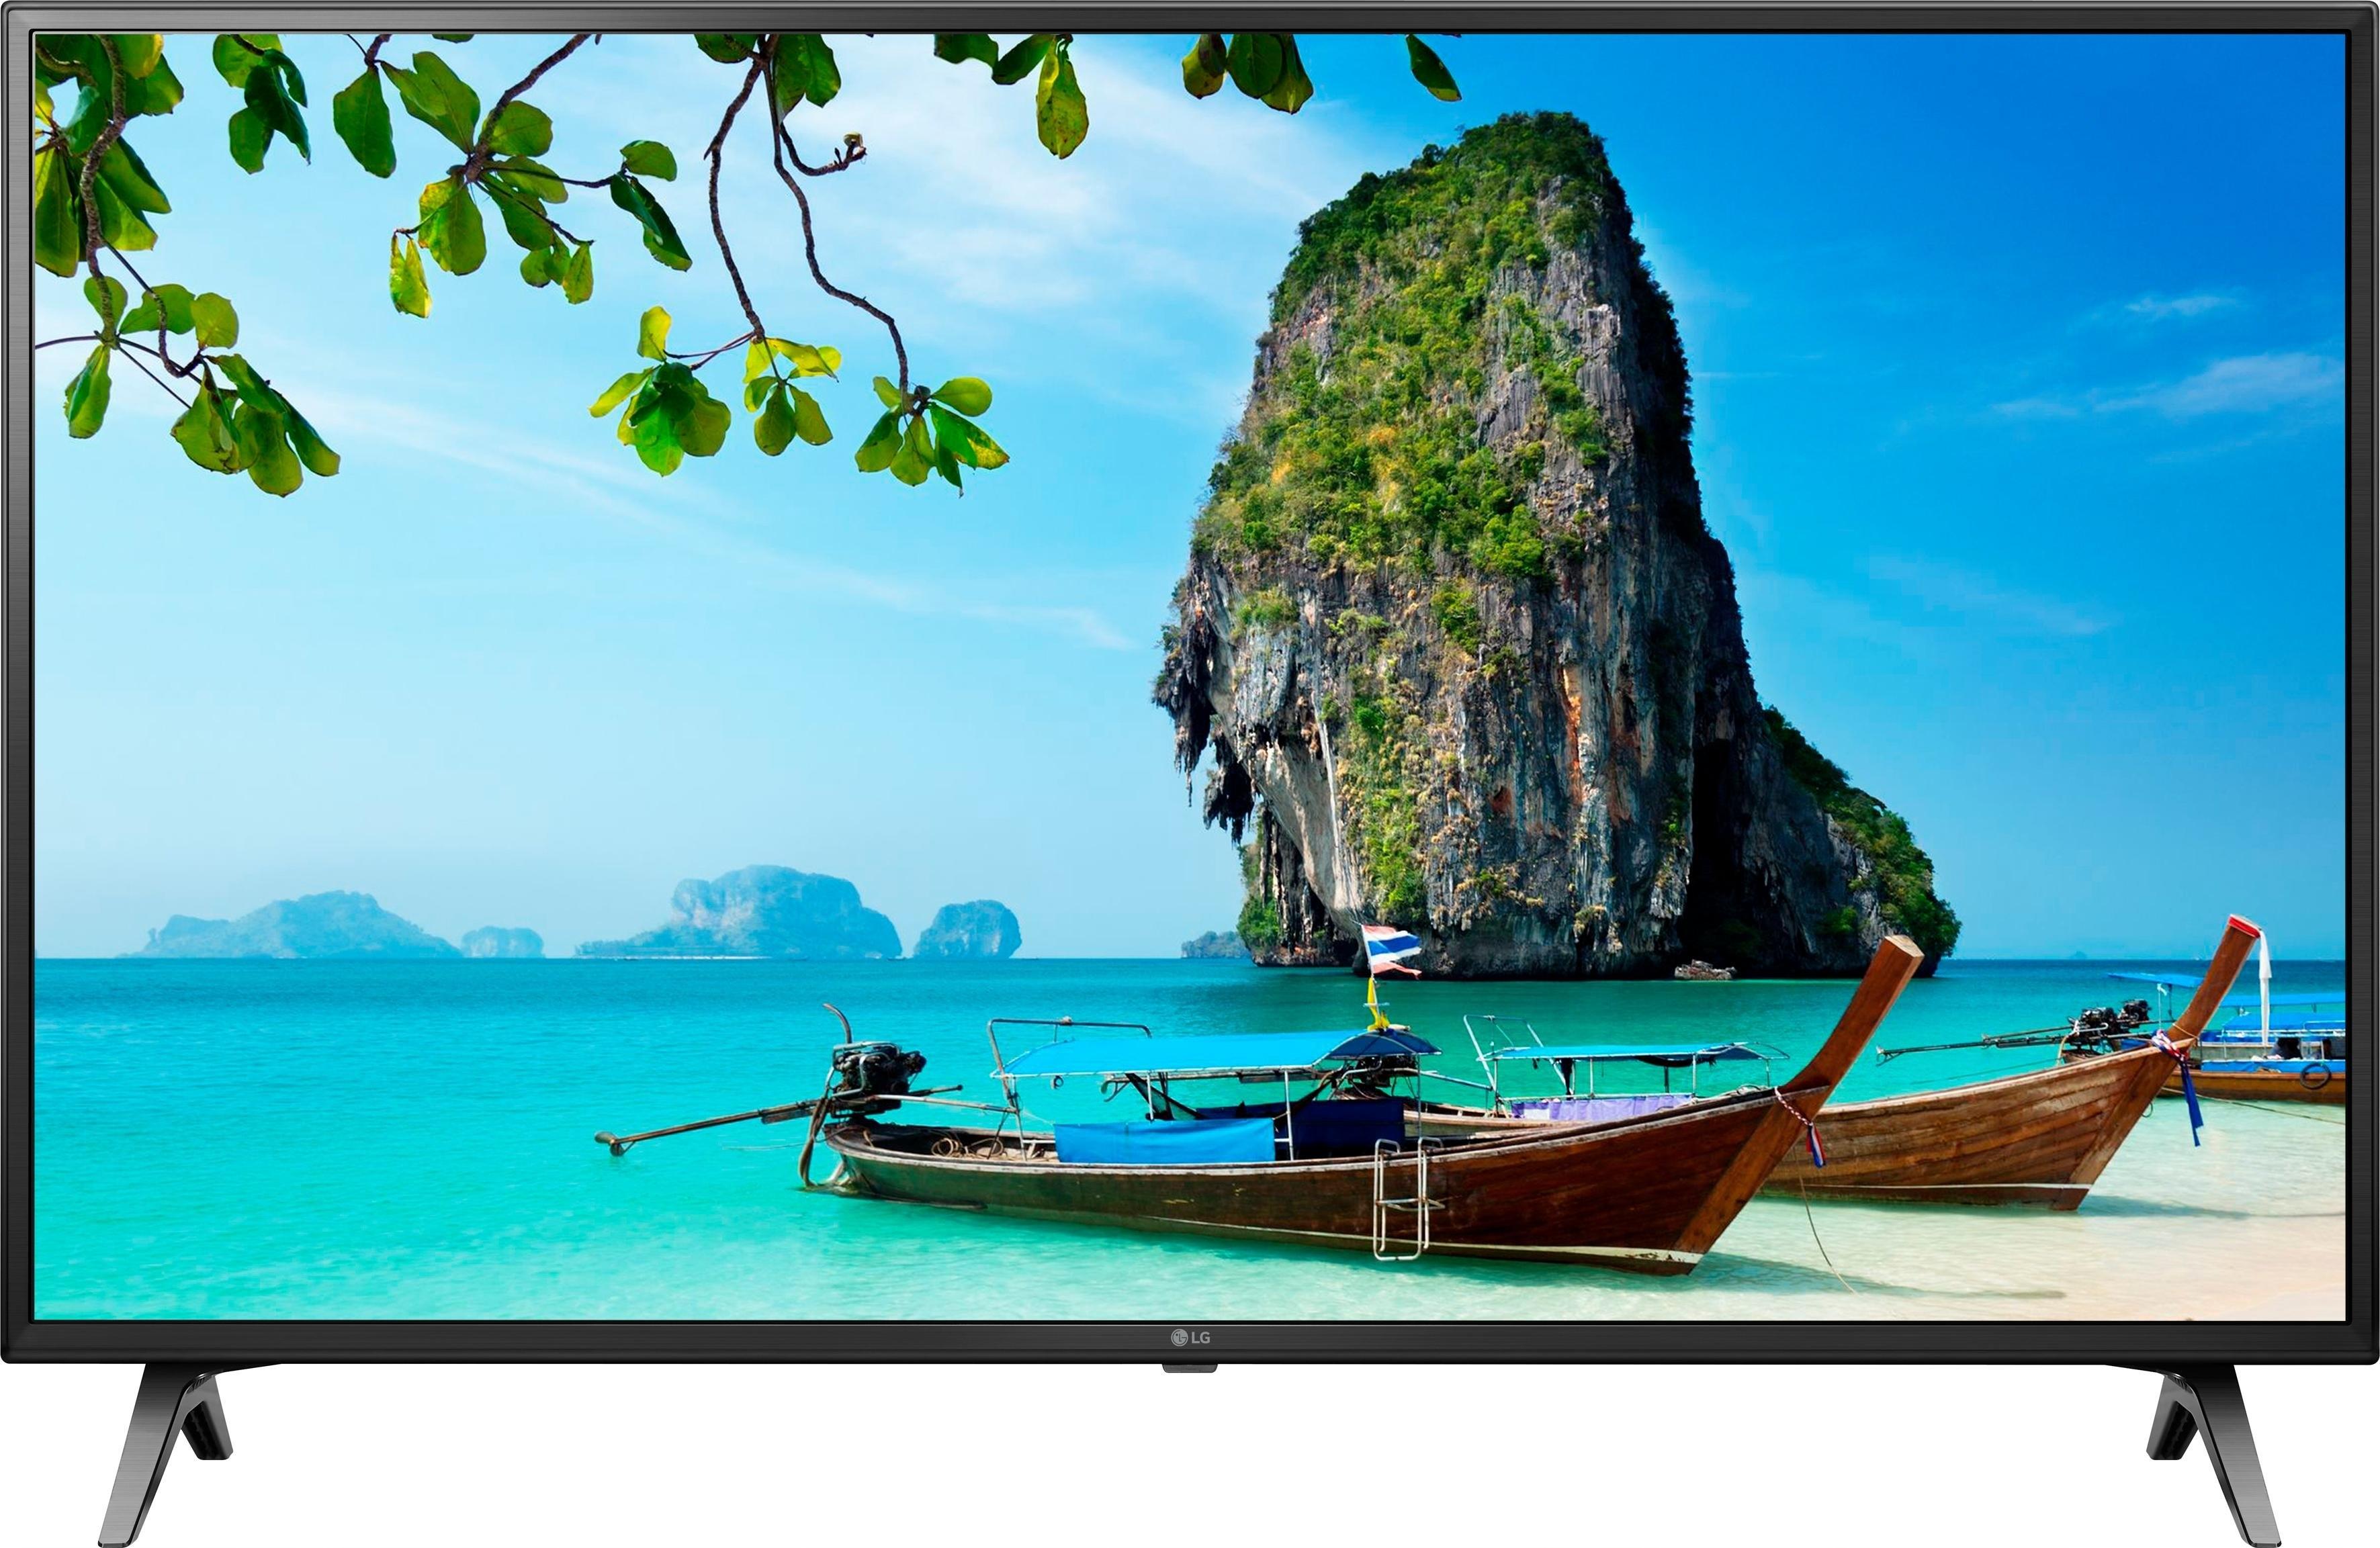 LG 60UM71007LB lcd-led-tv (153 cm / 60 inch), 4K Ultra HD, Smart-TV bestellen: 14 dagen bedenktijd